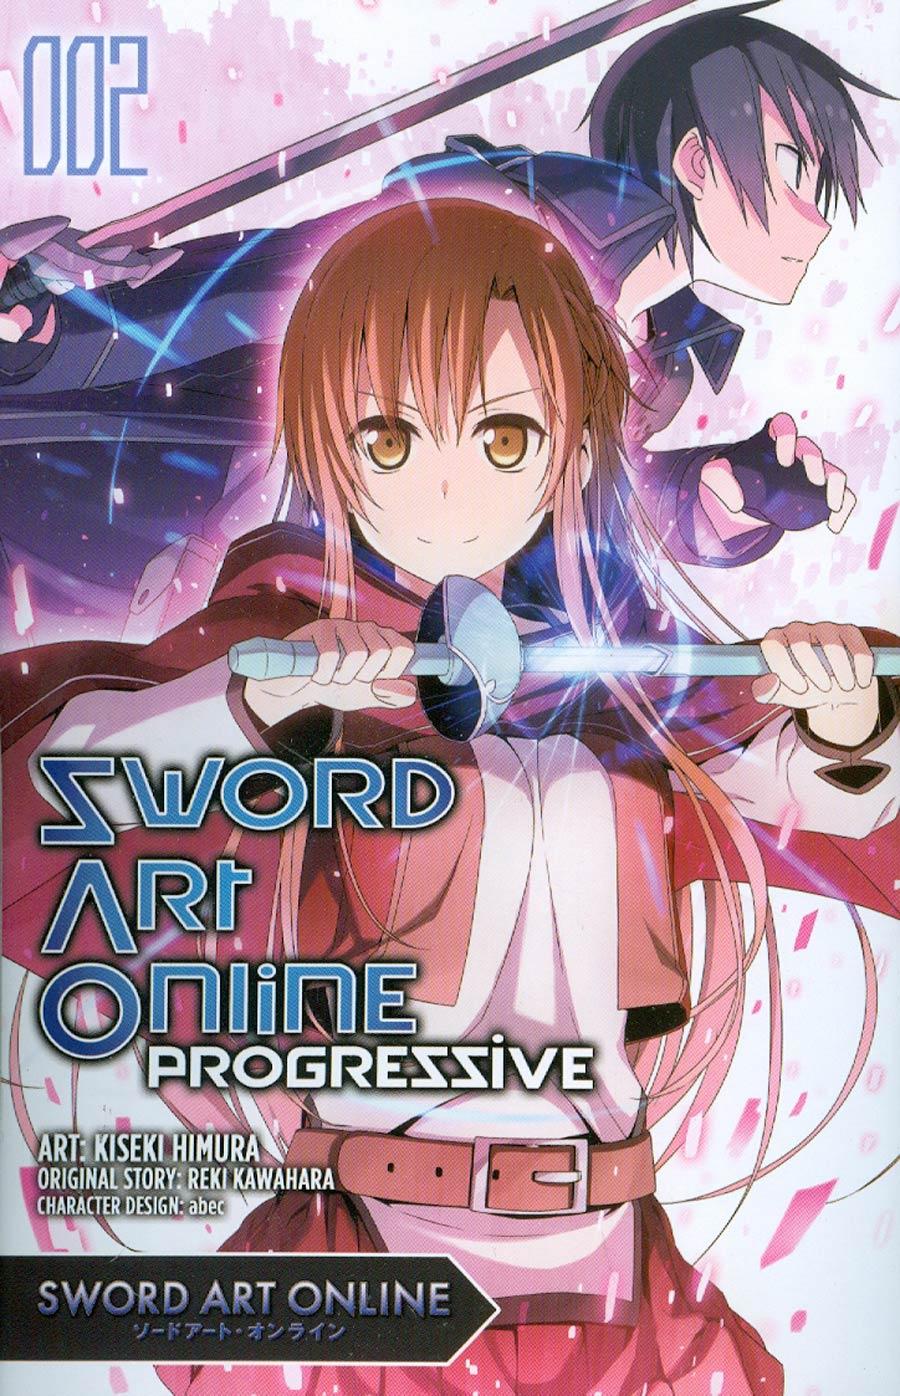 Sword Art Online Progressive Vol 2 GN